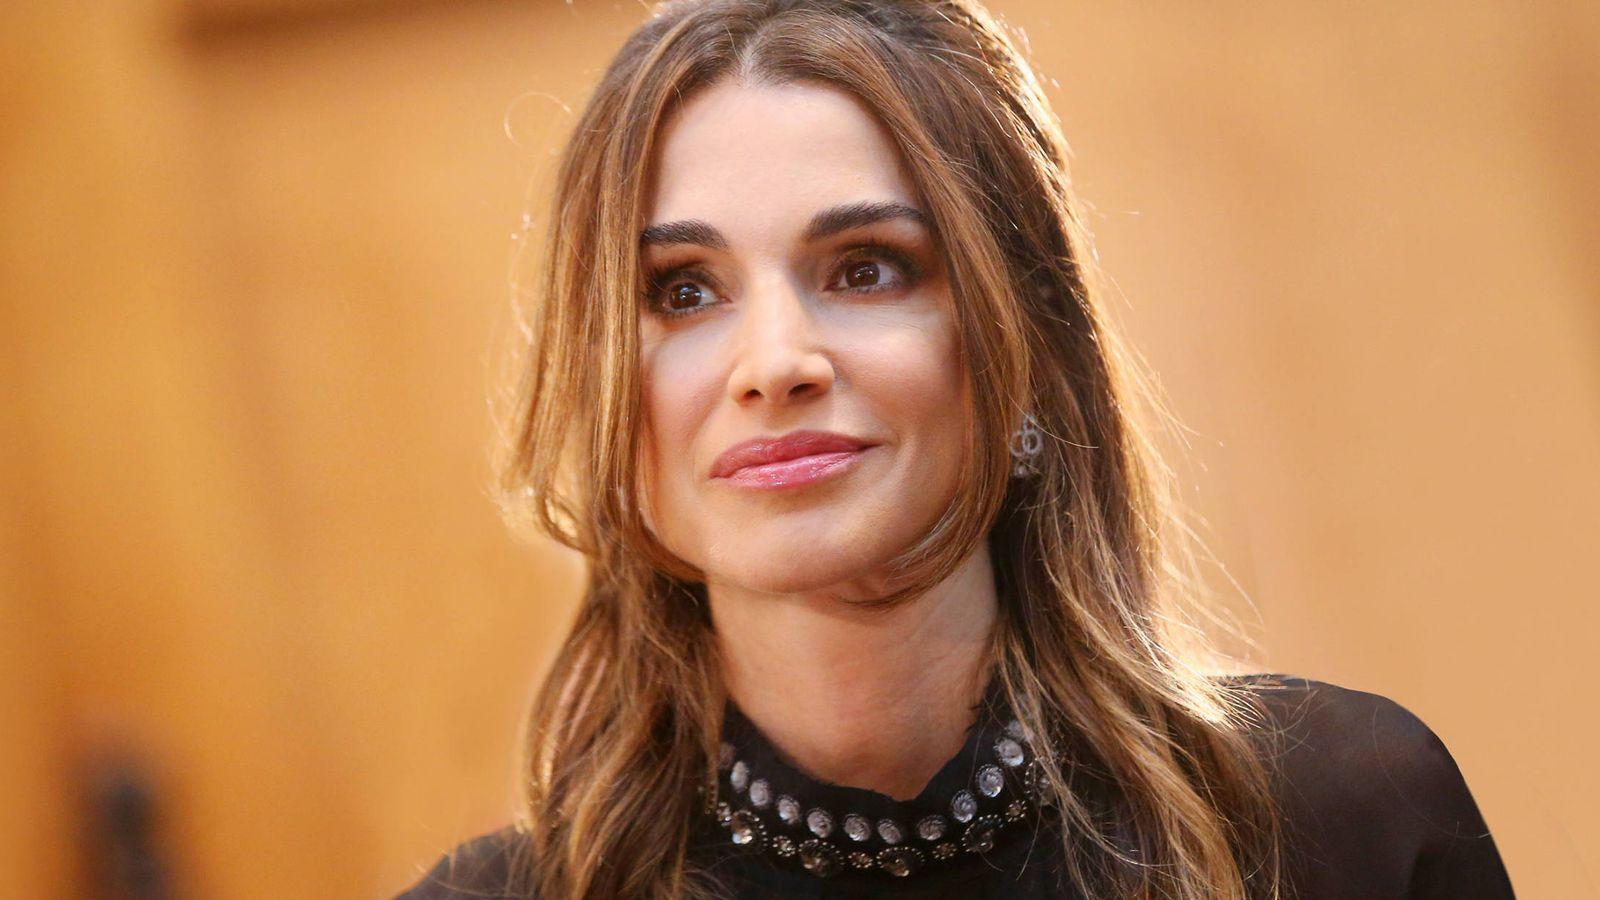 Foto: La reina Rania. (Getty)